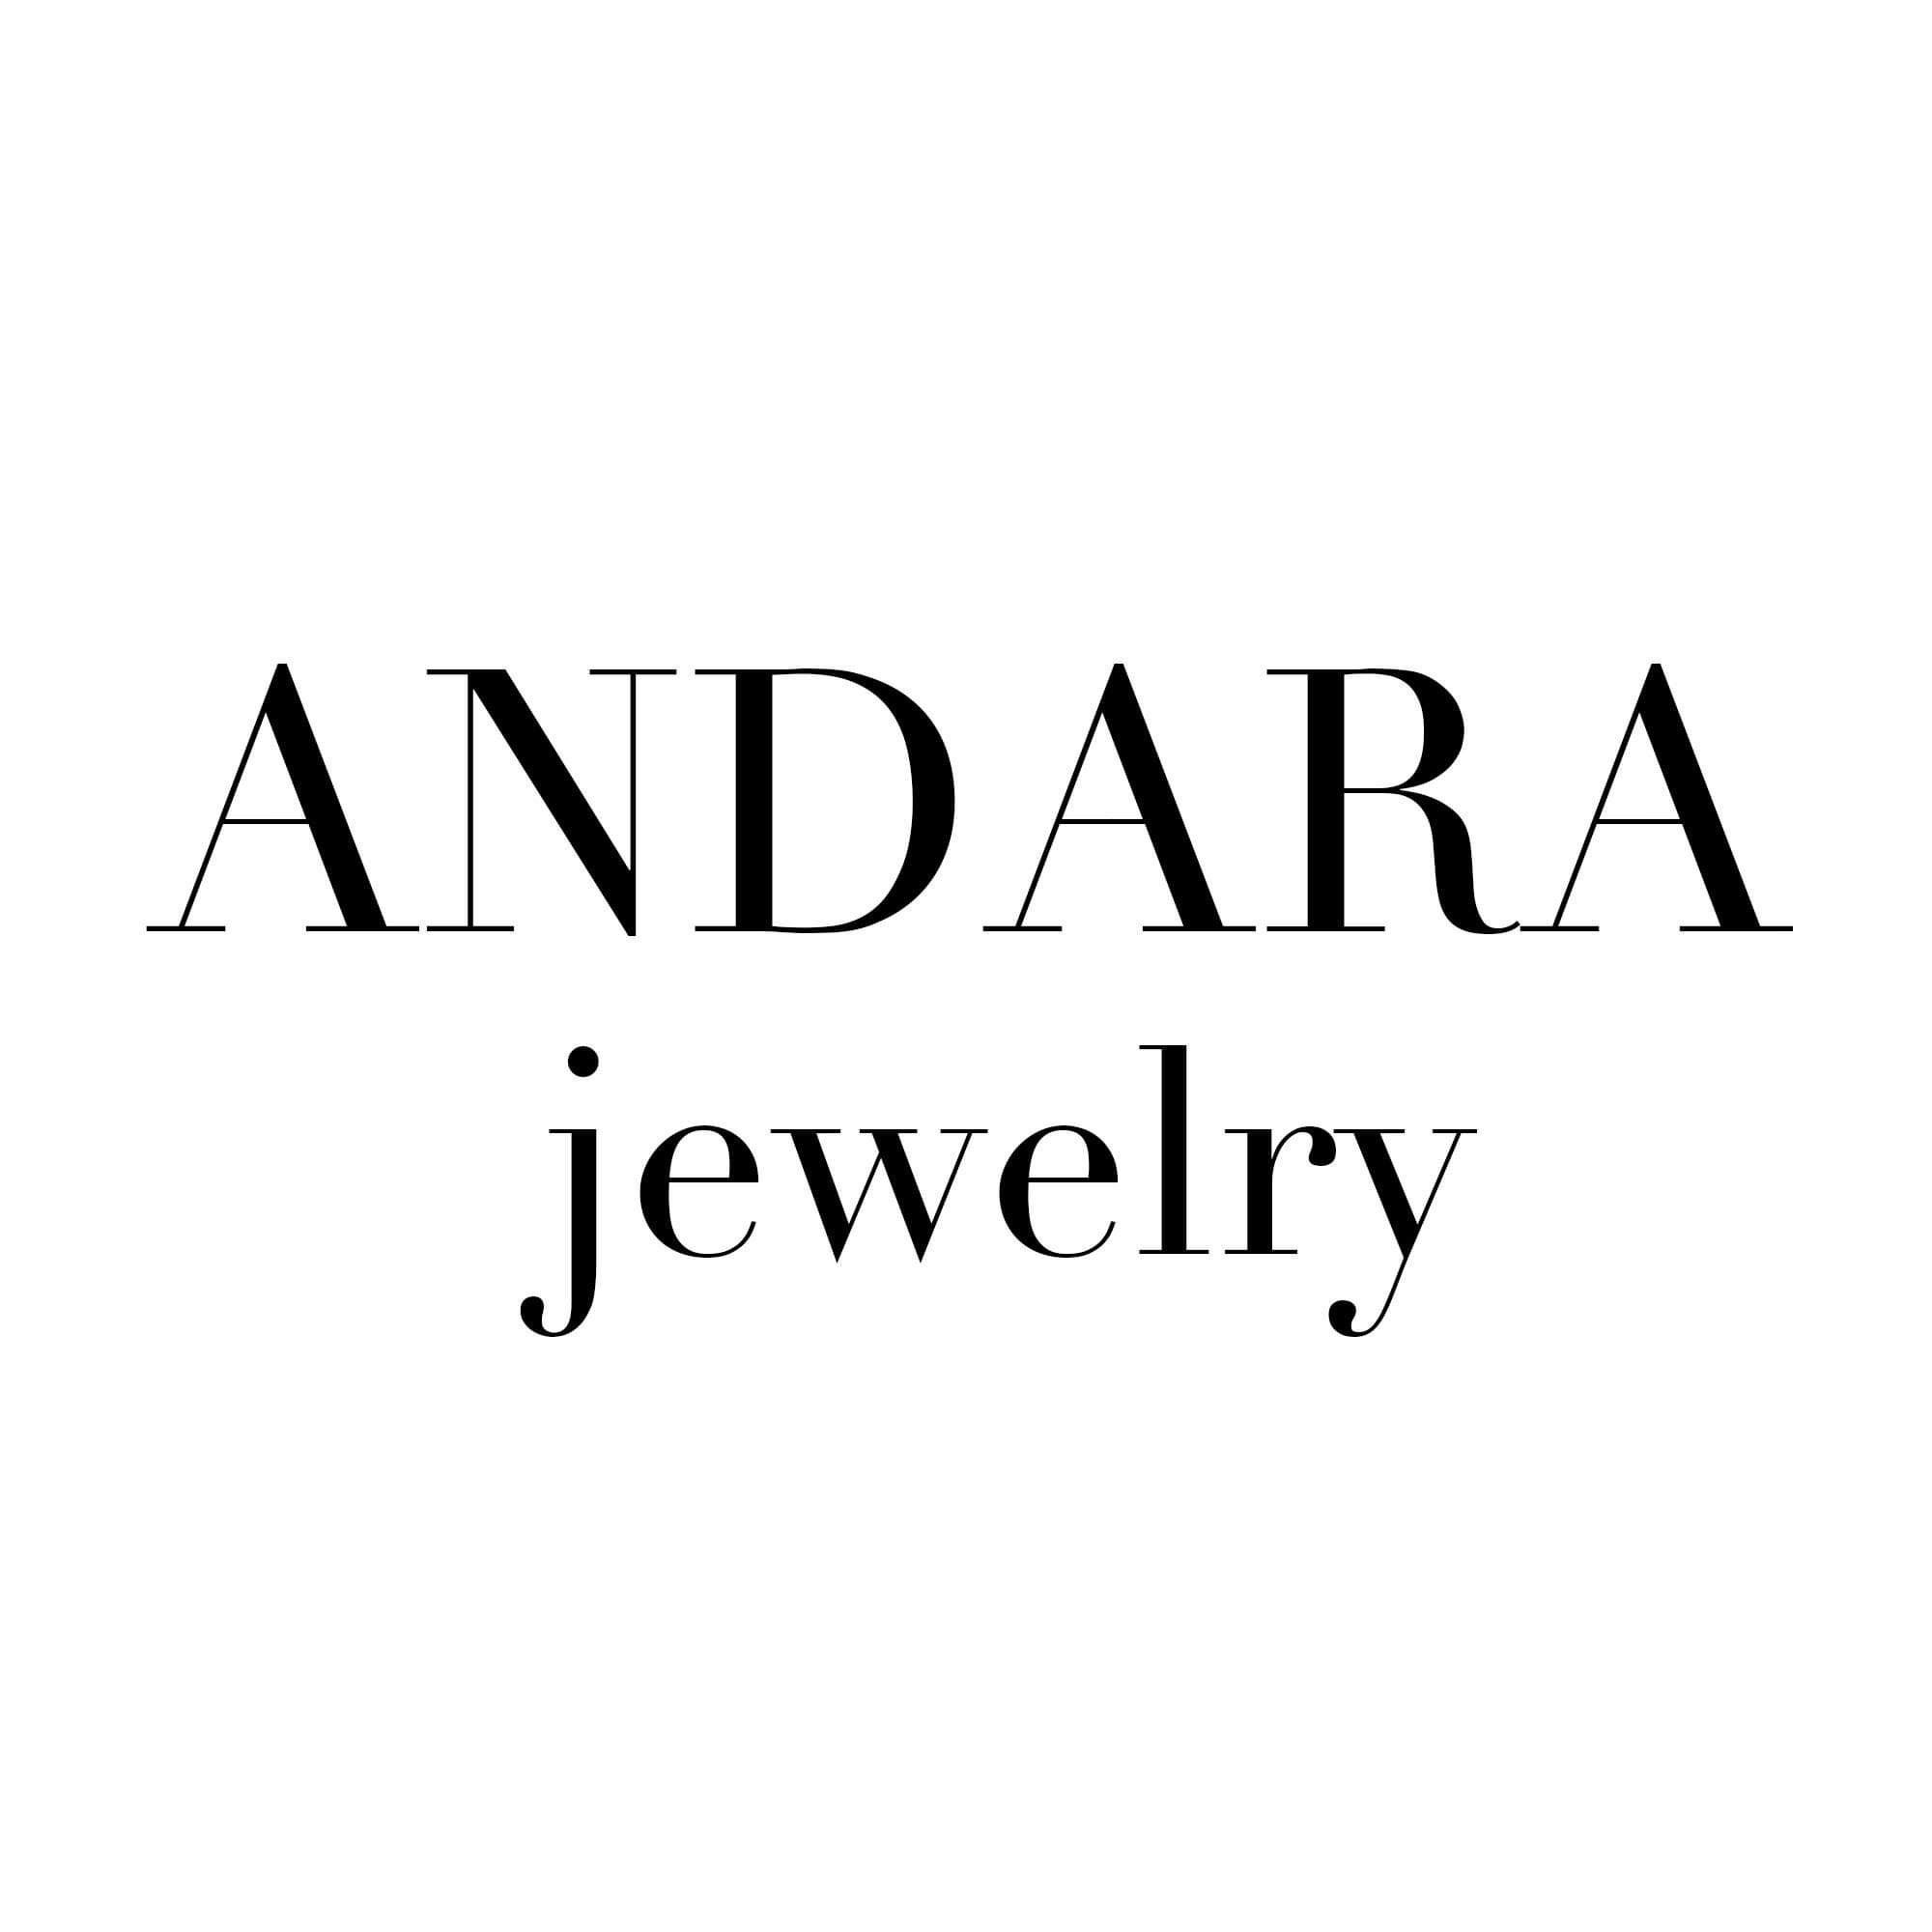 ANDARA jewelry FB